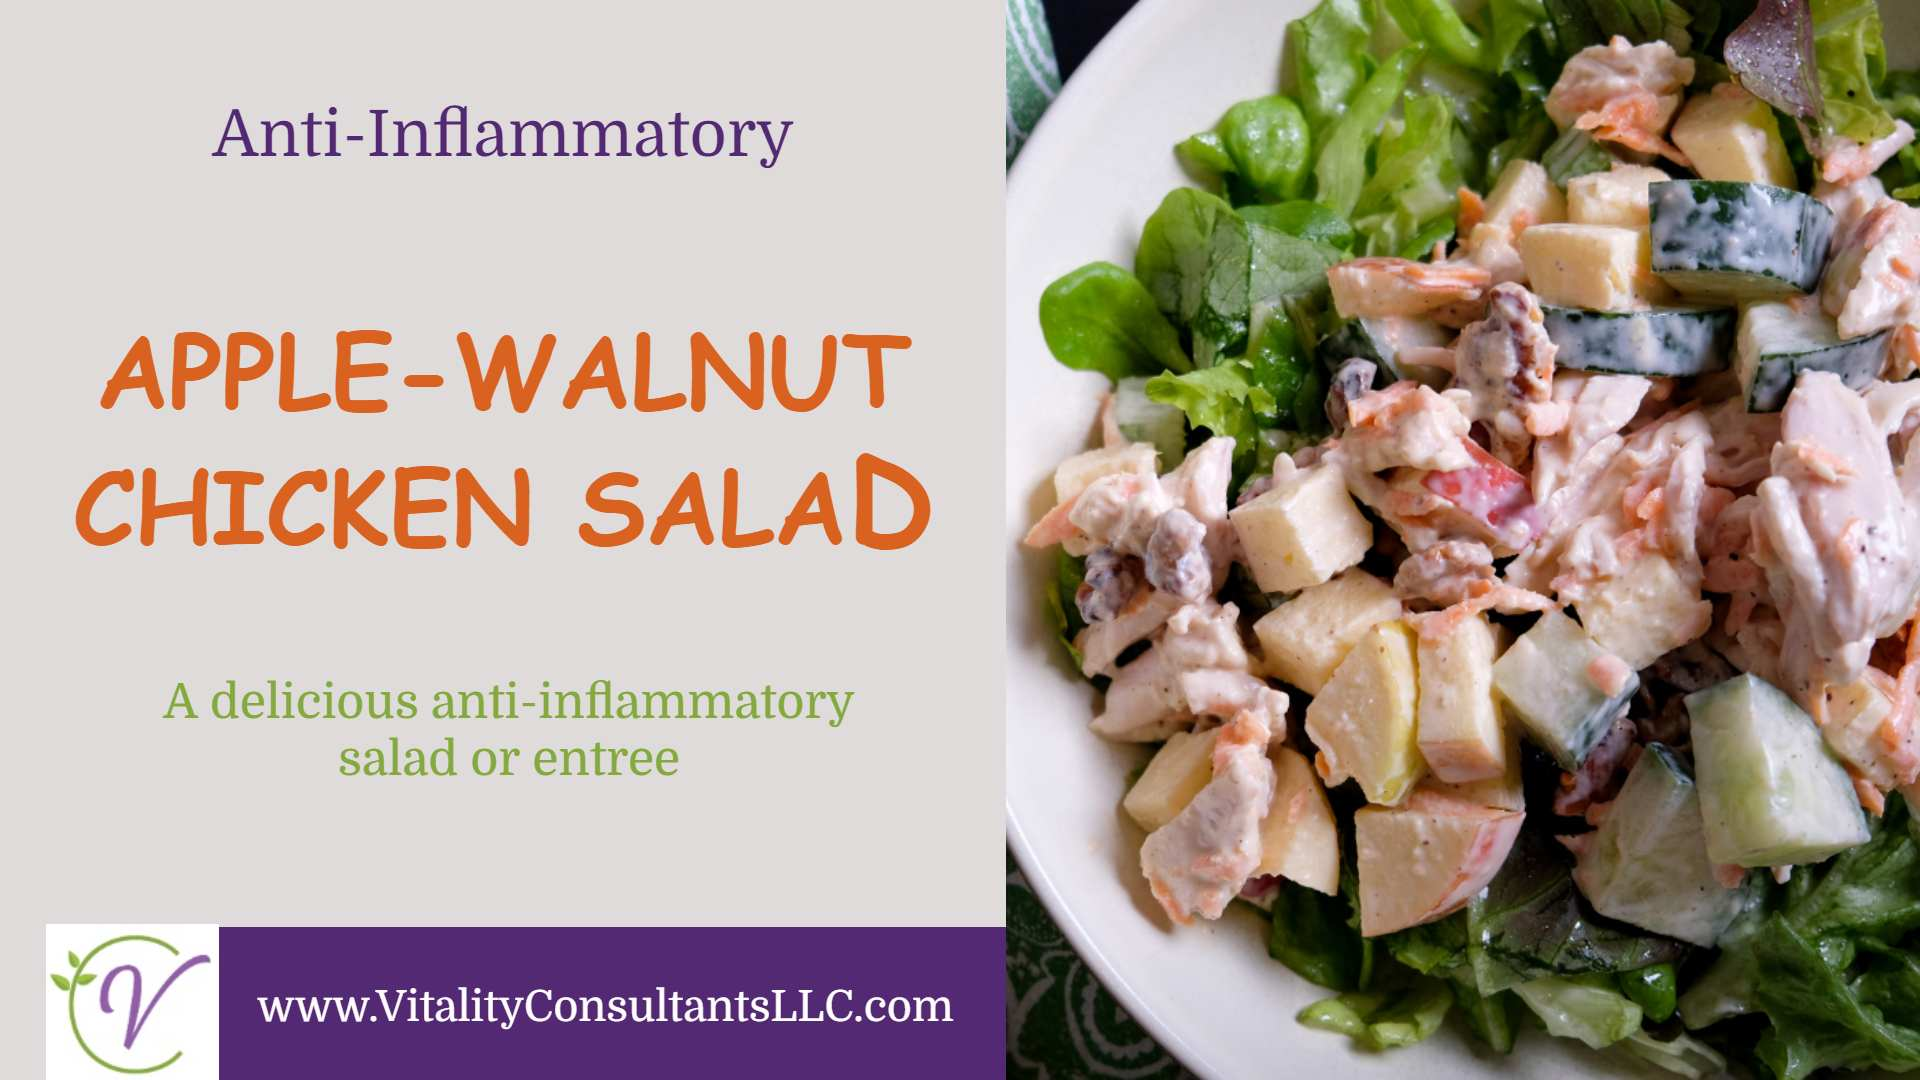 Apple-Walnut Chicken Salad